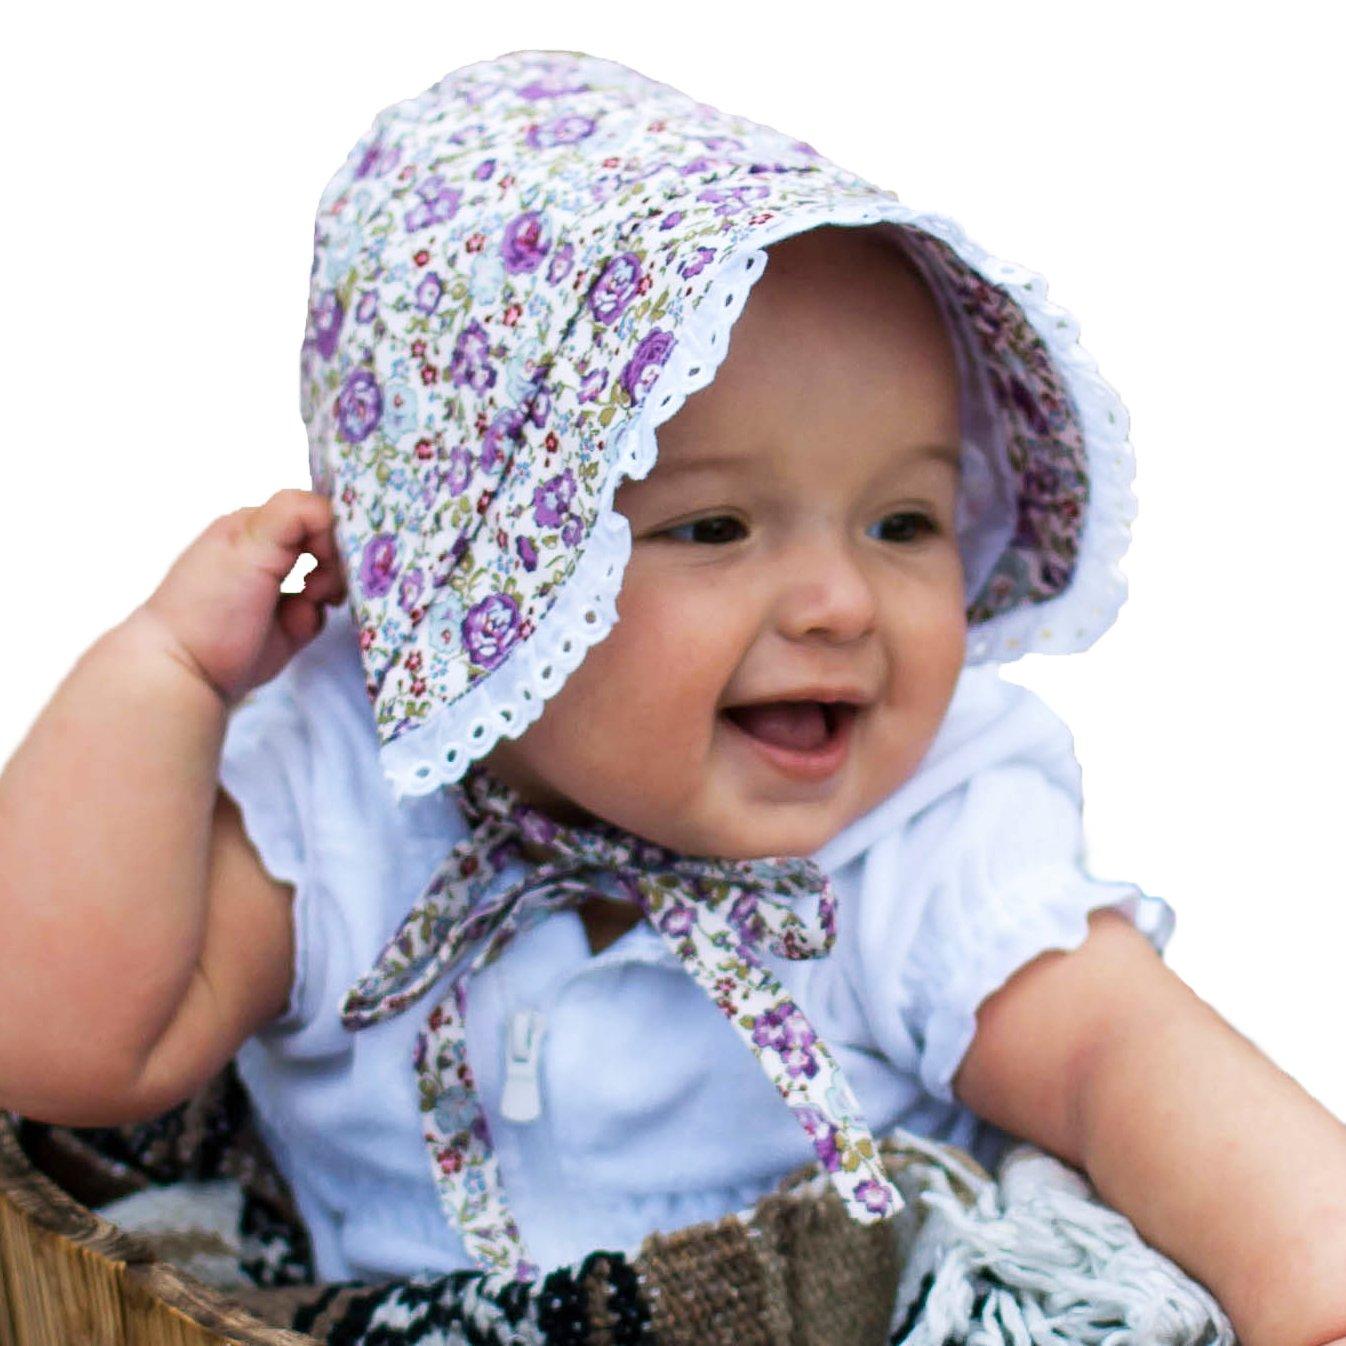 Huggalugs Baby & Toddler Girls Violet Flowers Bonnet UPF 25+ 0-3 by Huggalugs